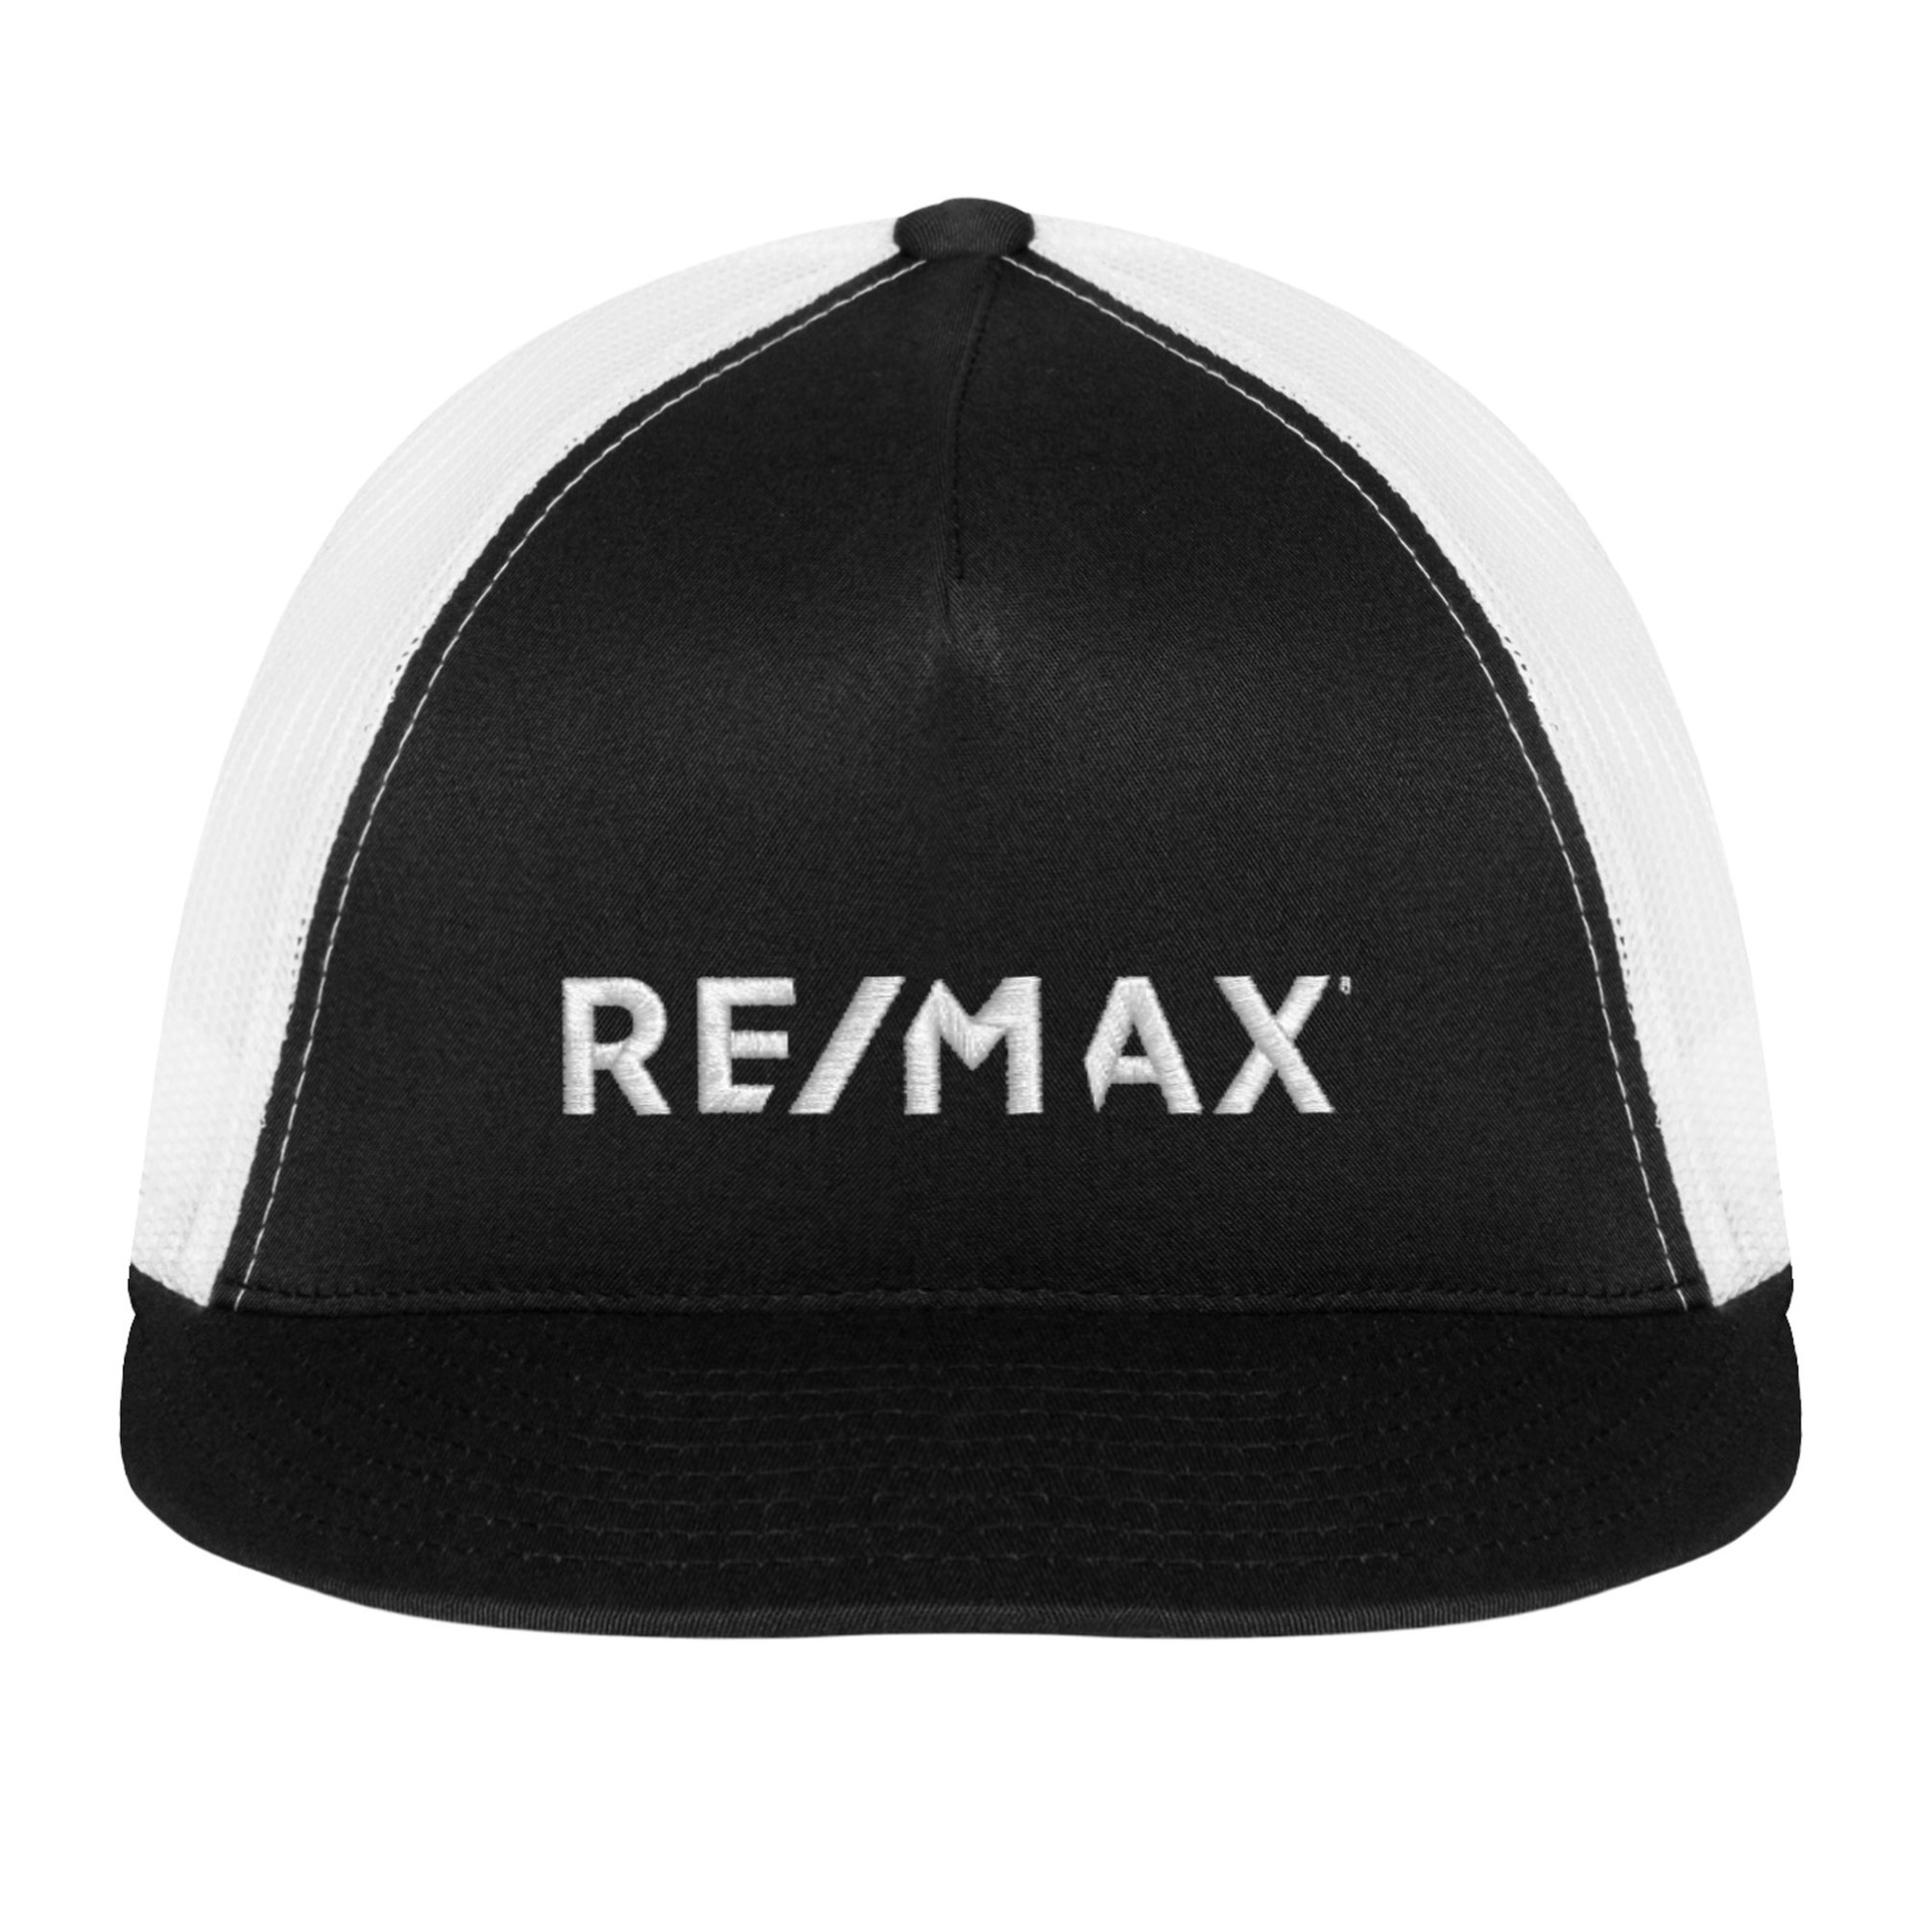 Picture of Remax Five-Panel Classic Trucker Cap